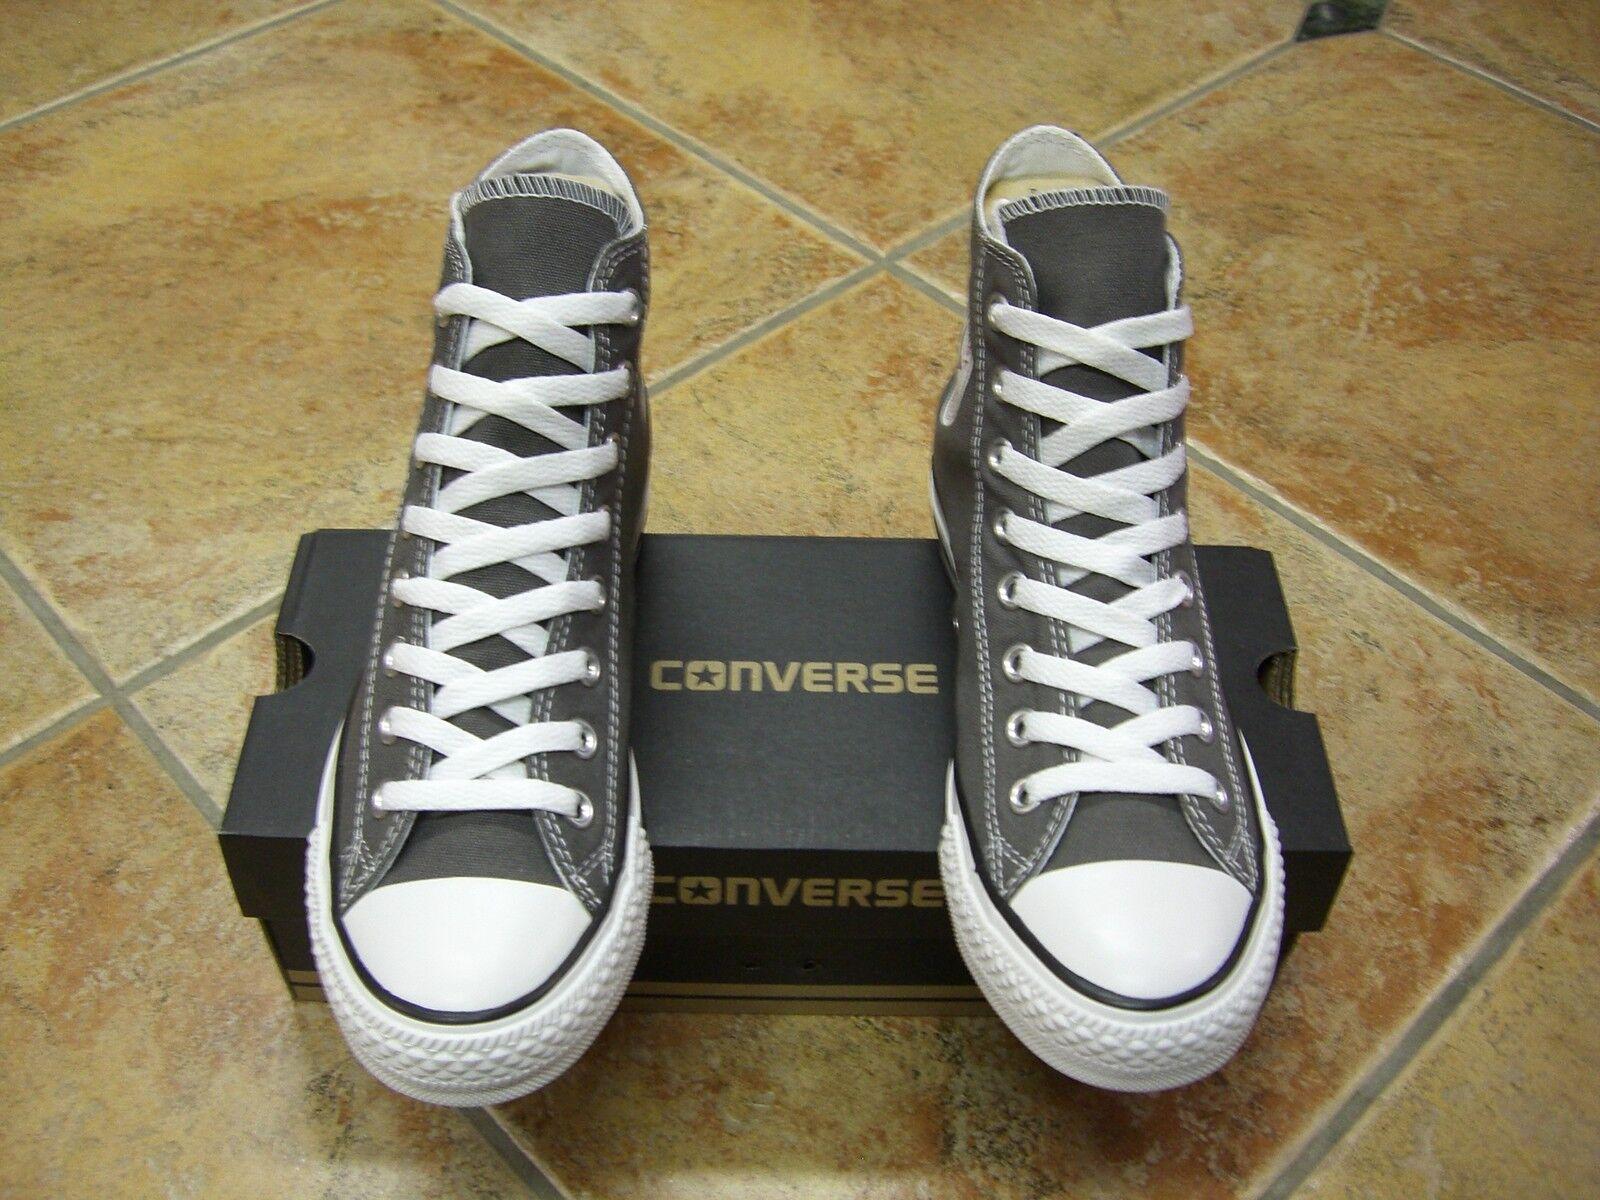 Converse Chucks All Star HI Gr.42 charcoal 1J793 NEU